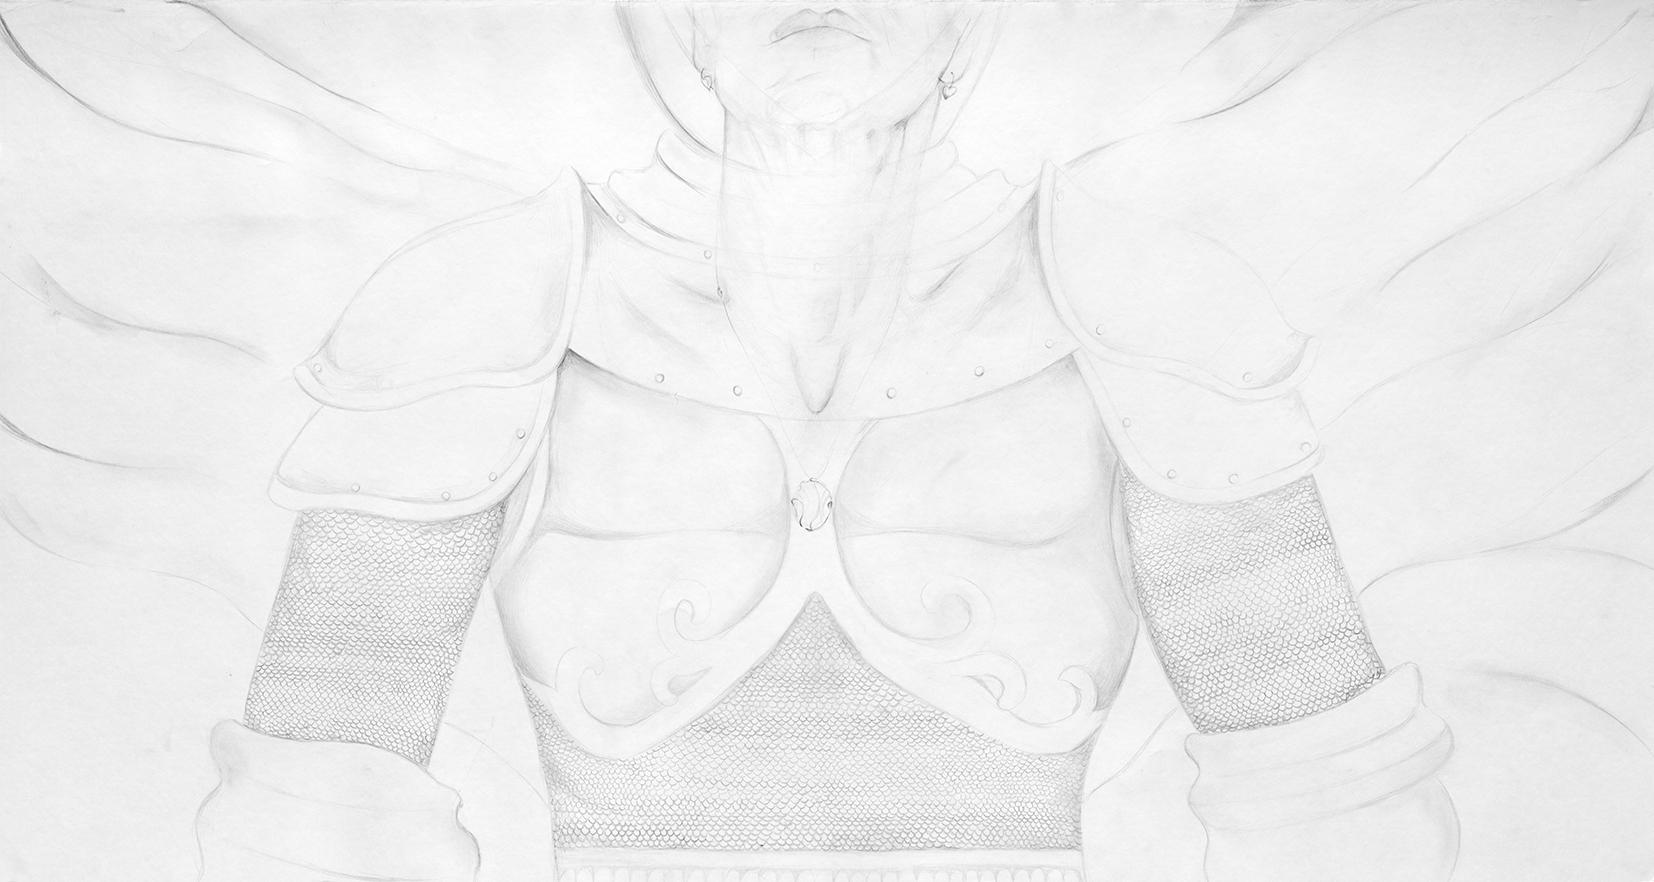 Under armored wings #5 By Nurit Barak kachtan